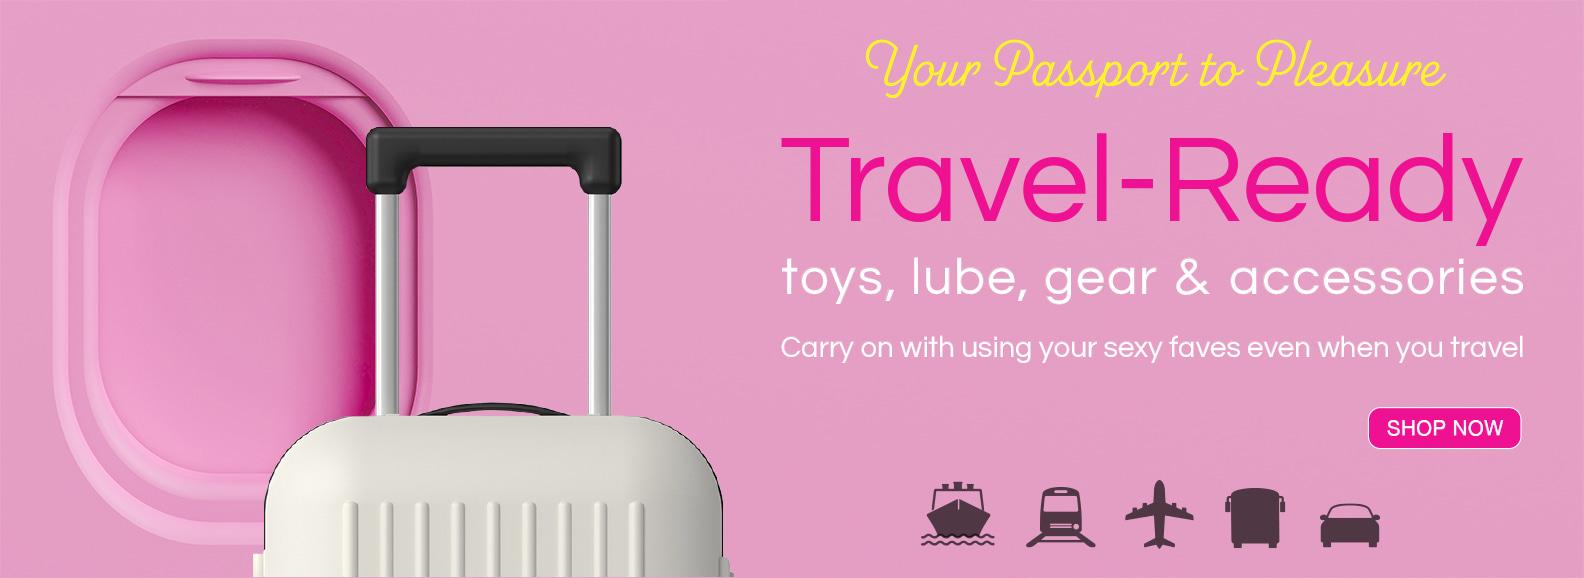 Travel-Ready Toys